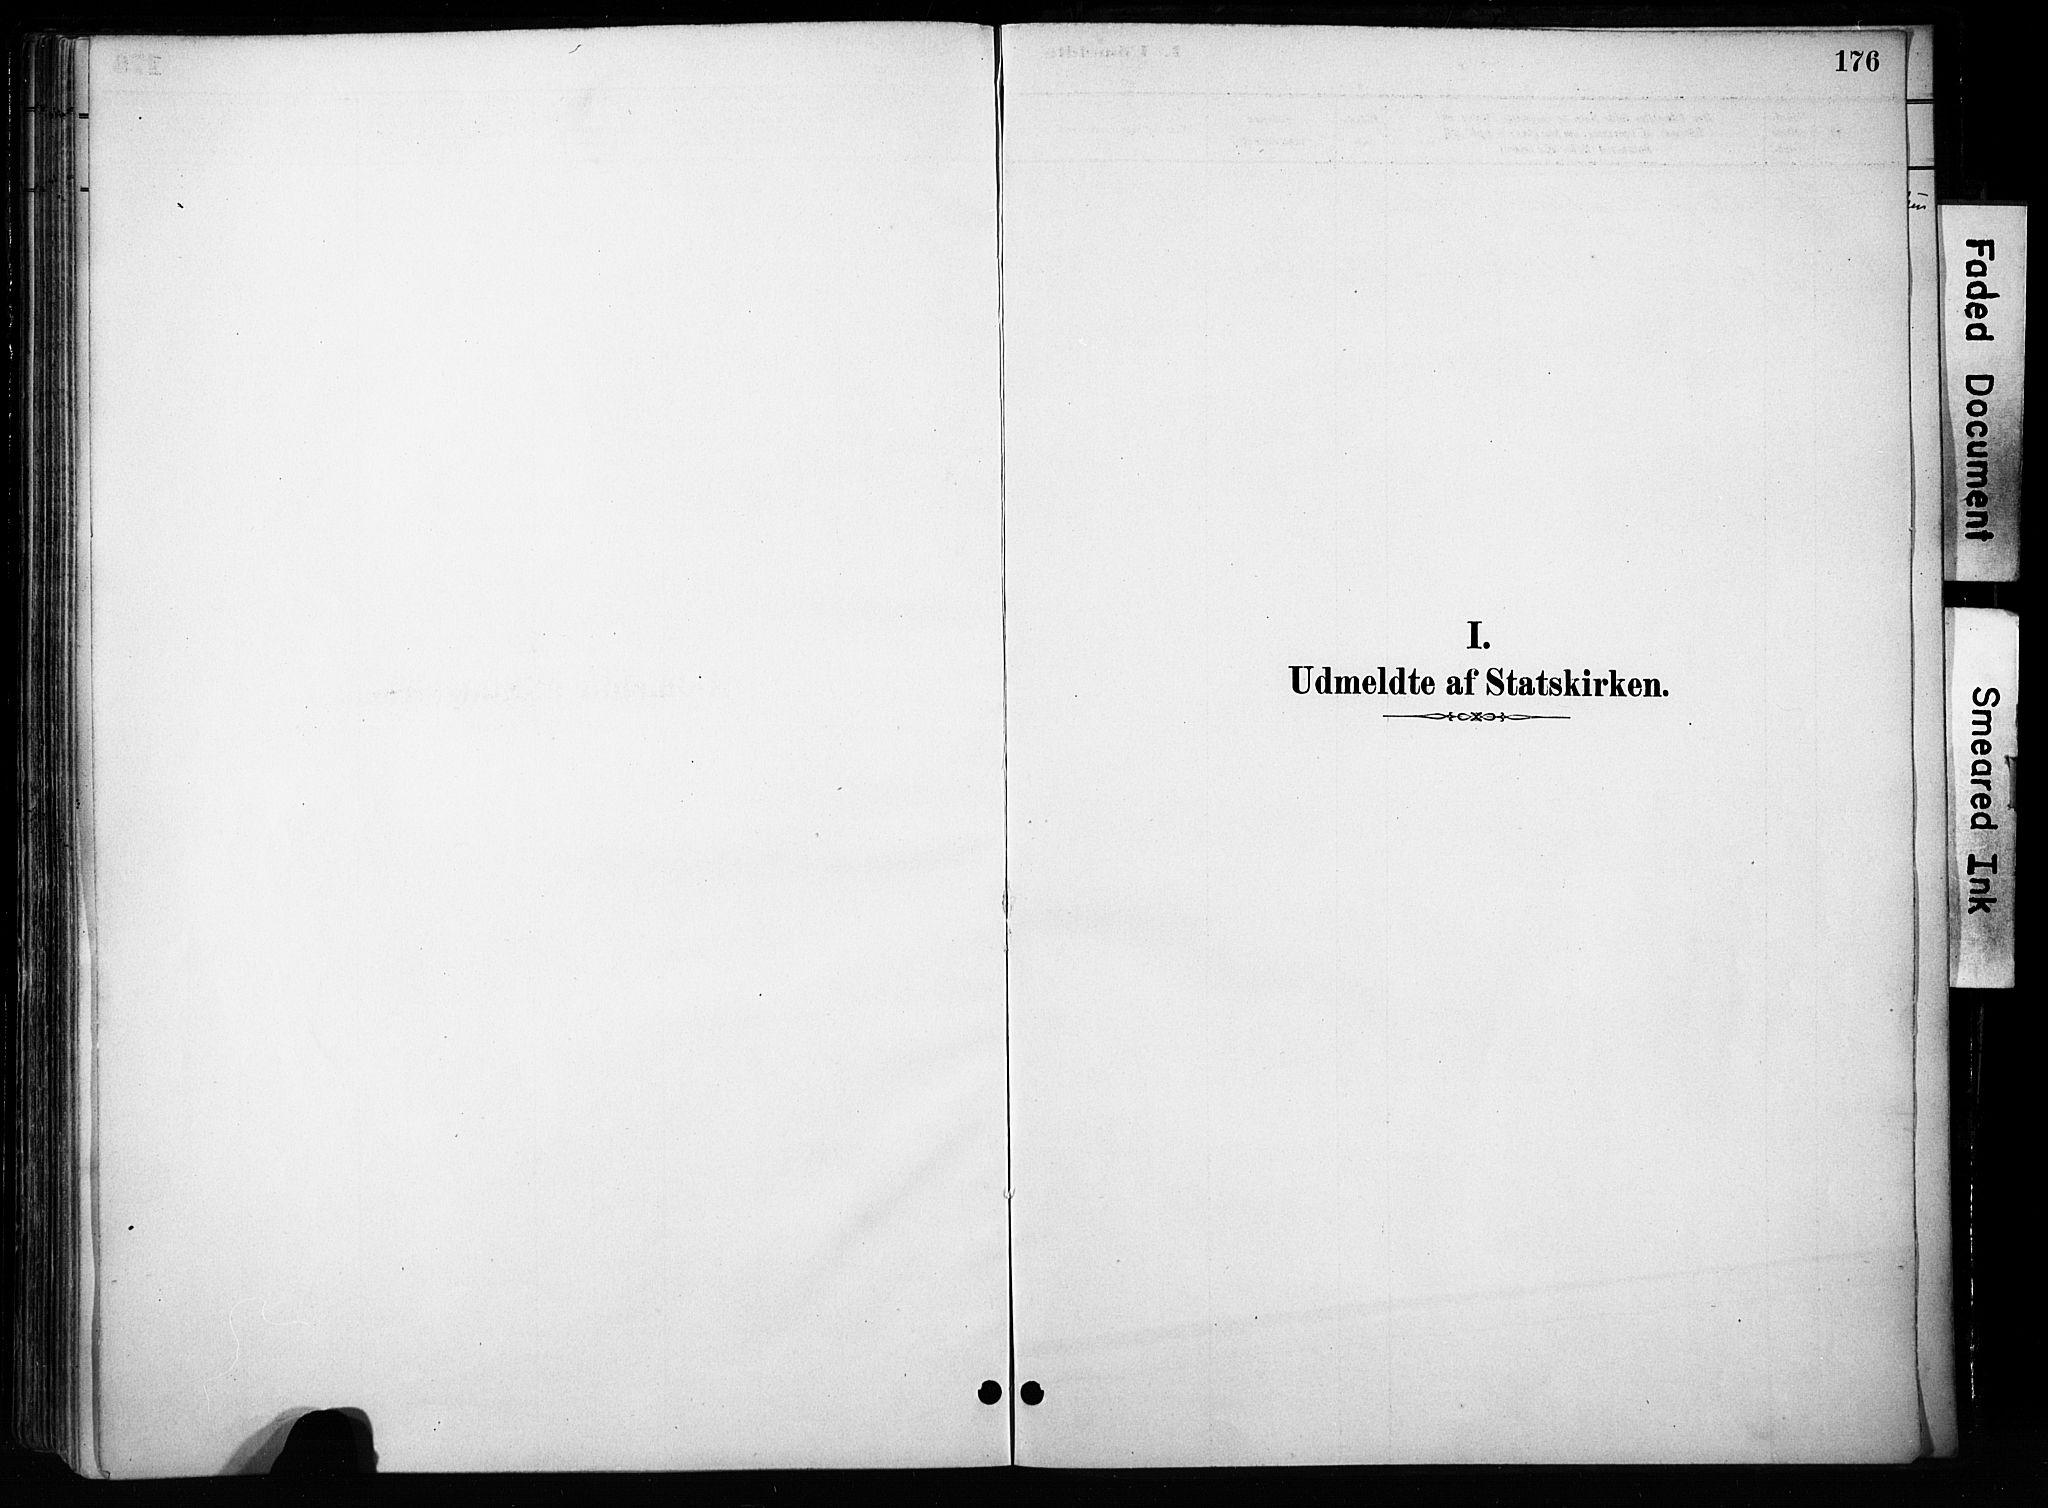 SAH, Skjåk prestekontor, Ministerialbok nr. 4, 1880-1904, s. 176